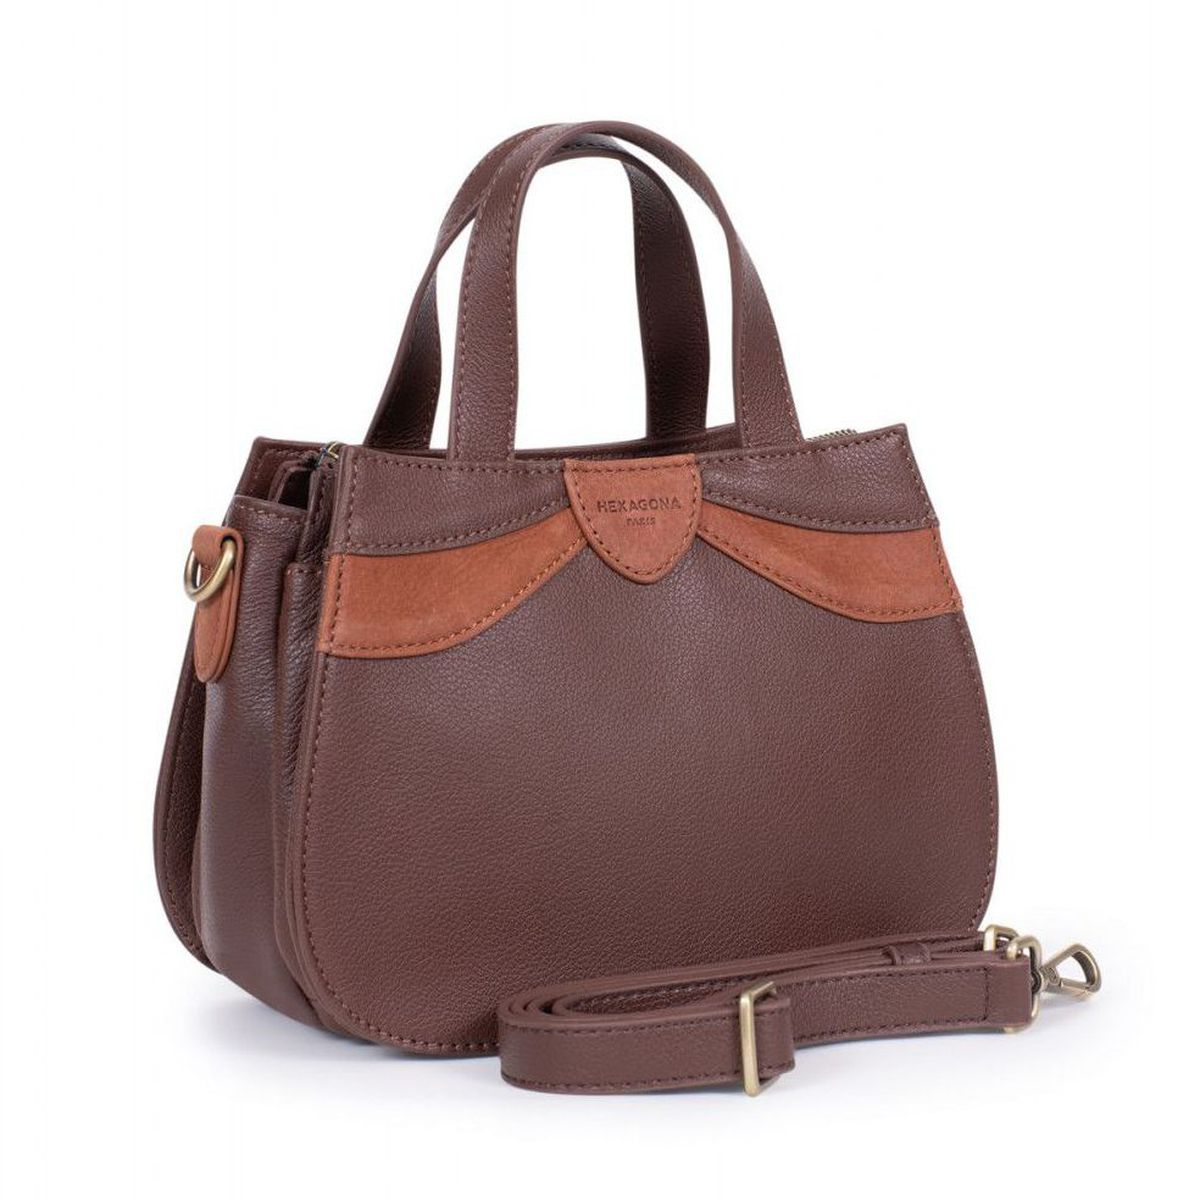 1. 2 handles leather bag Brown Hexagona